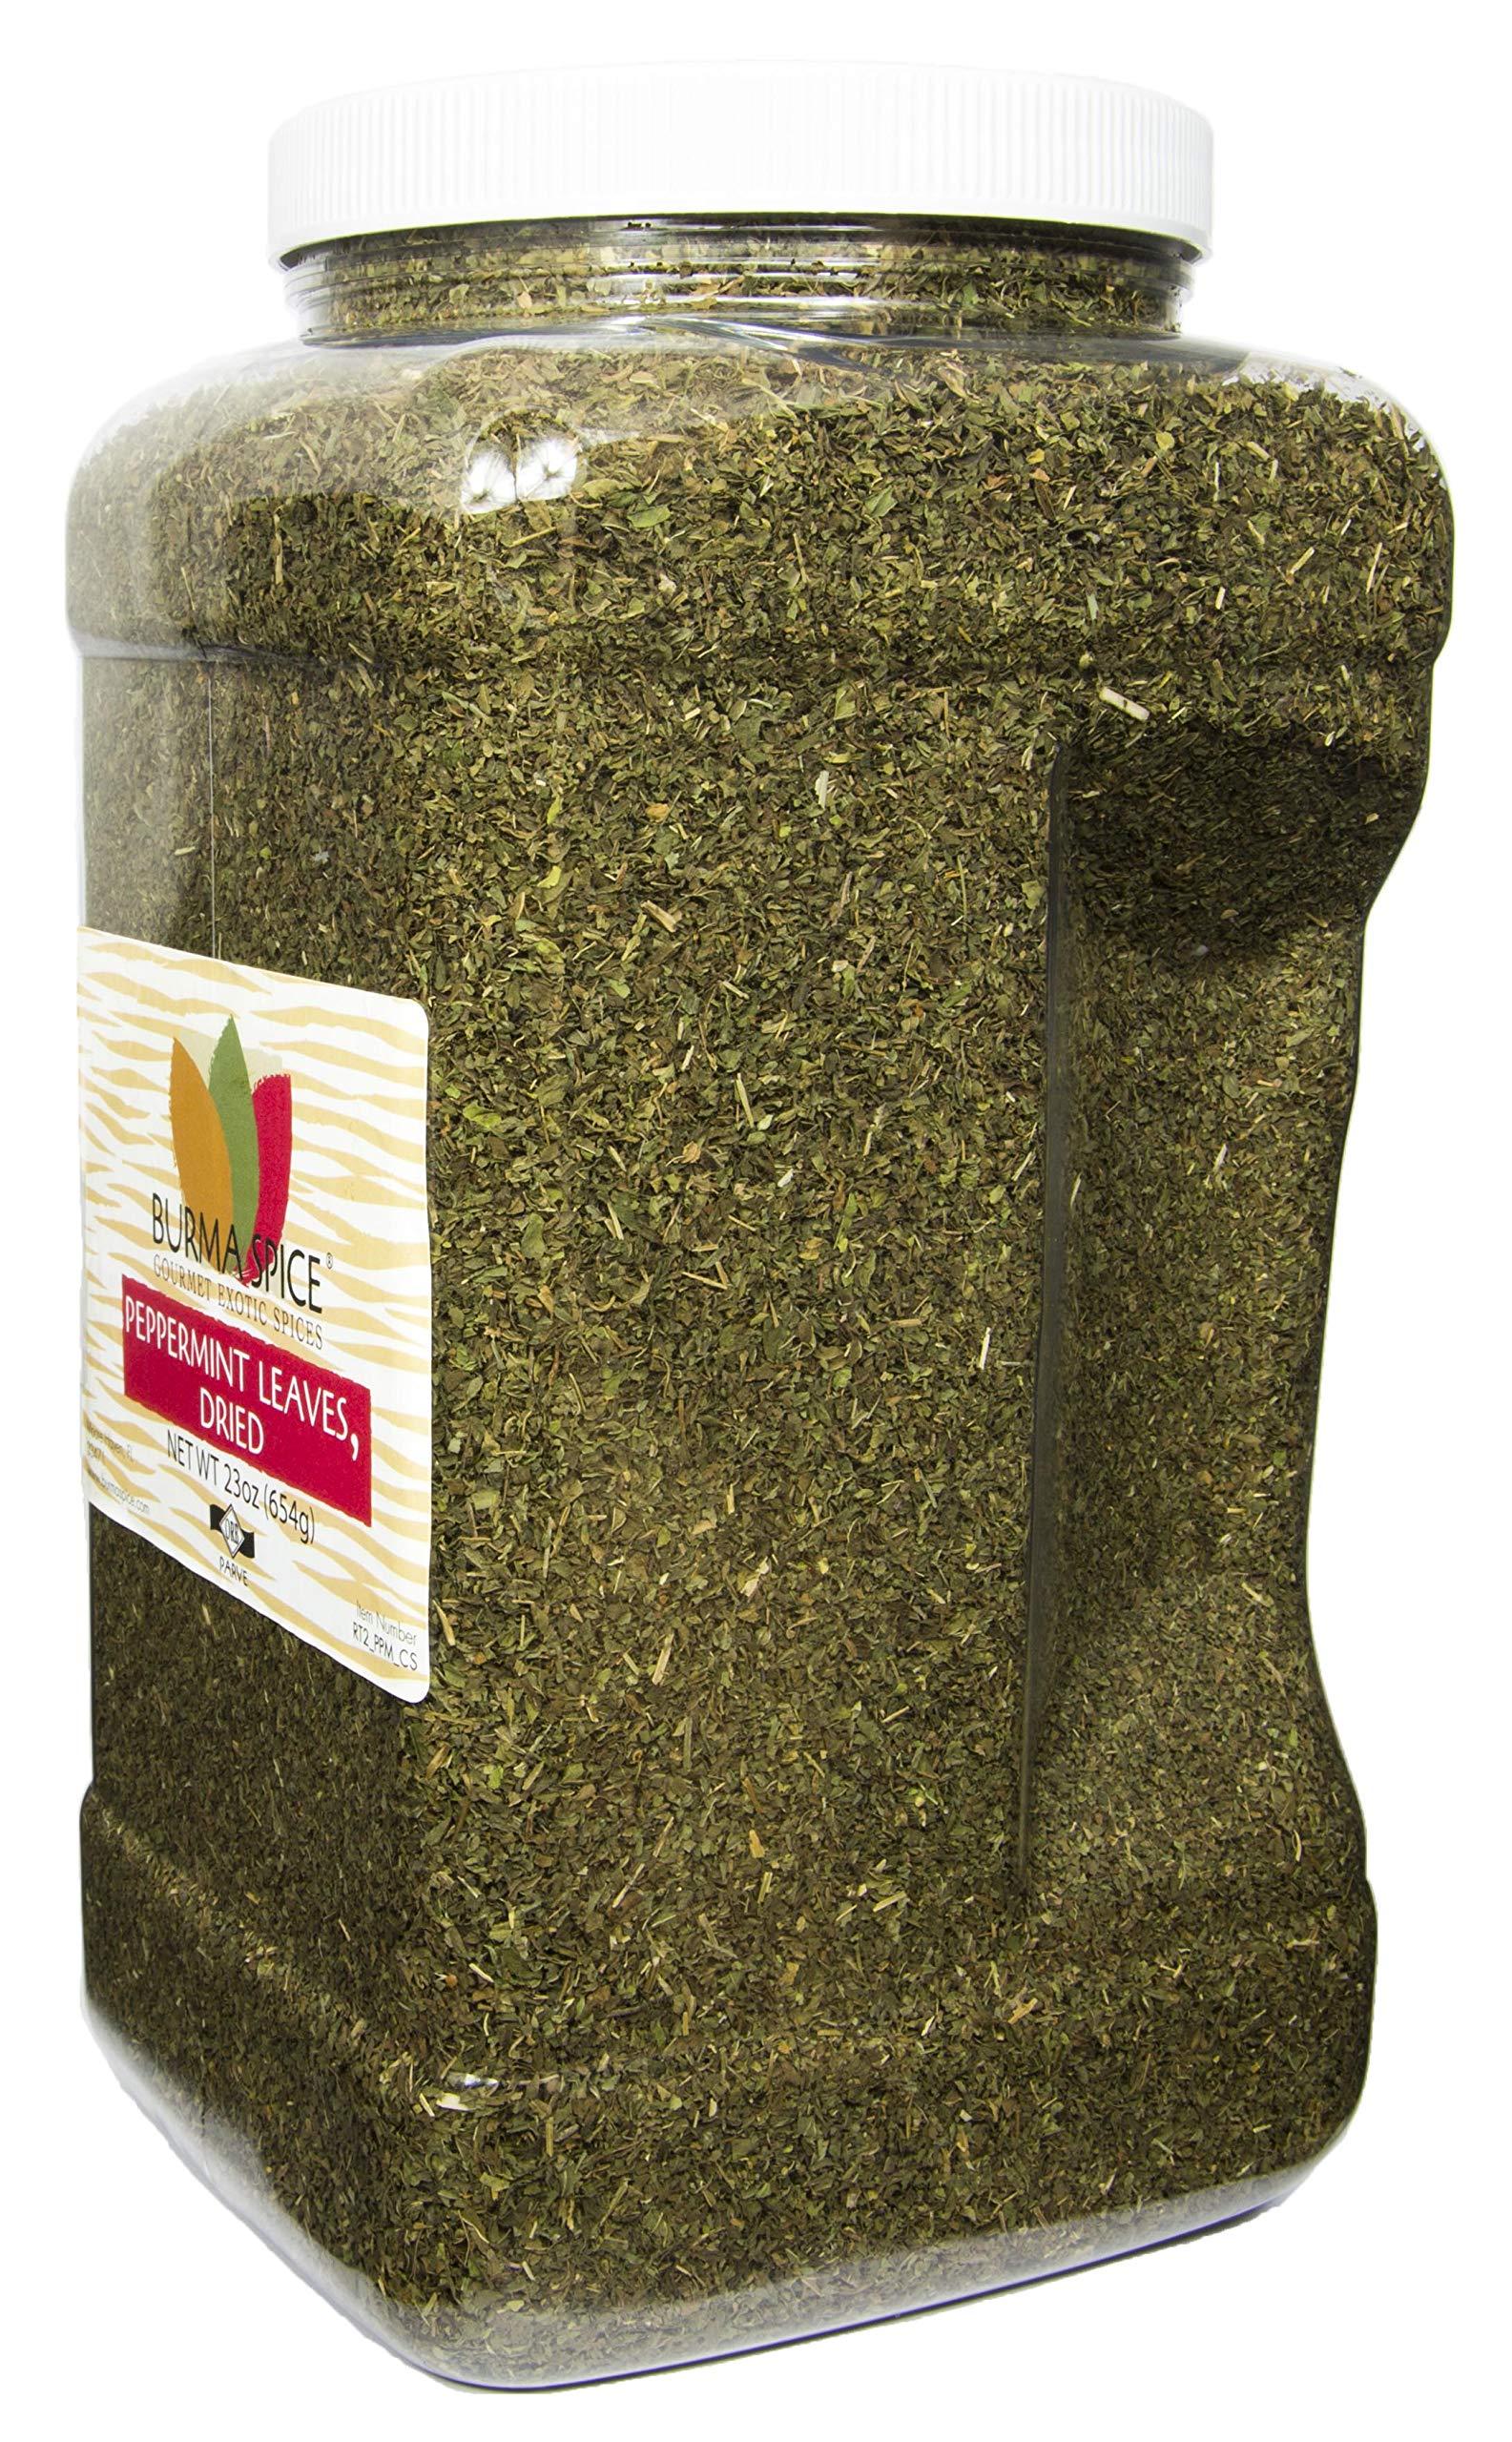 Peppermint Leaves : Dried Herb Loose Leaf Mint Tea : Caffeine-Free Kosher (23oz.) by Burma Spice (Image #2)